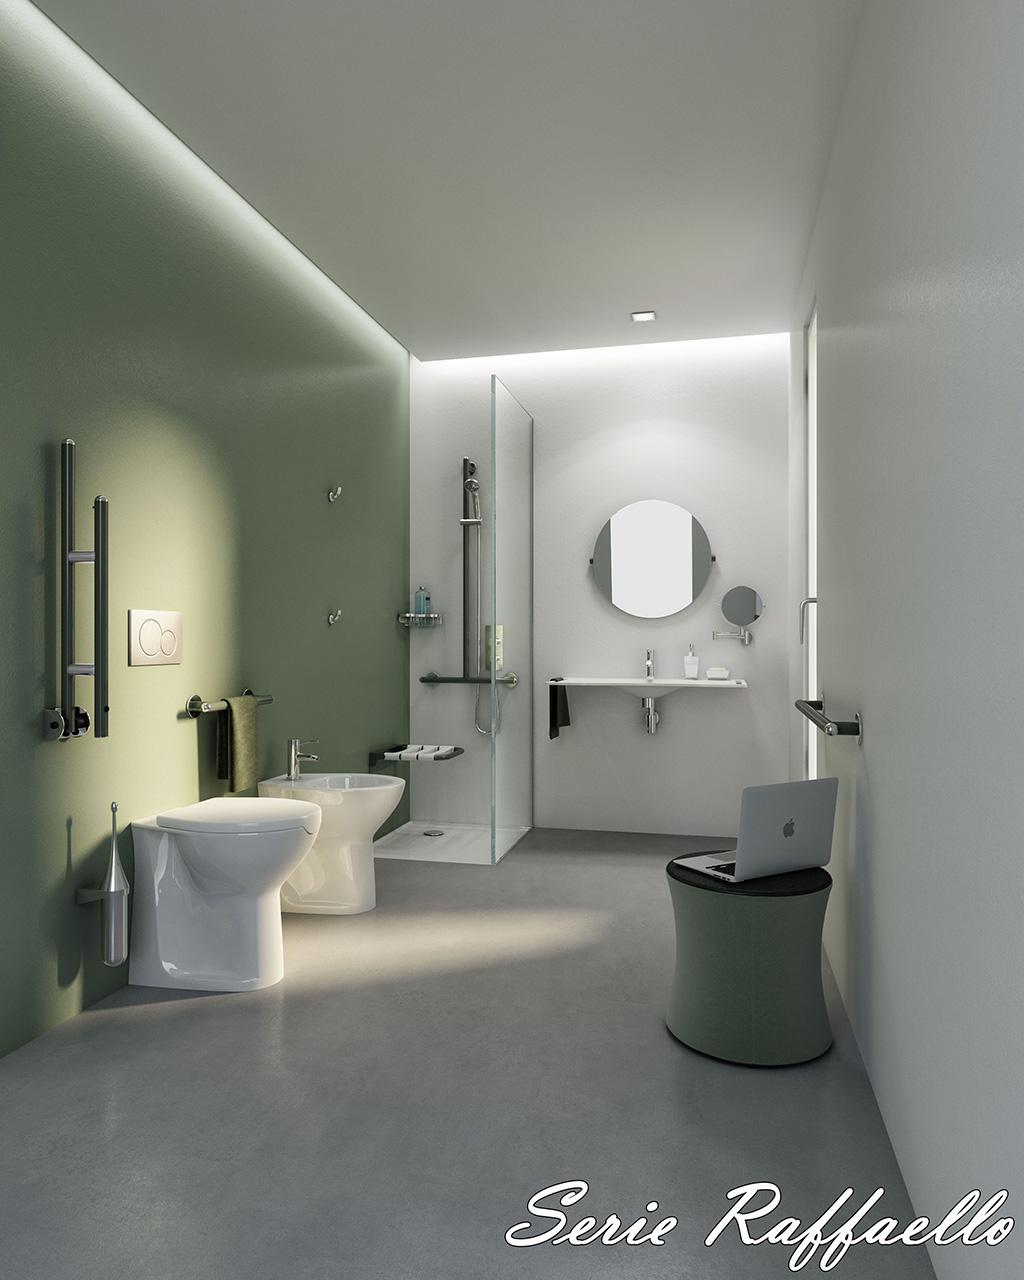 Elderly Bathroom: Bathrooms For The Elderly, Grab Bars, Seating, Taps